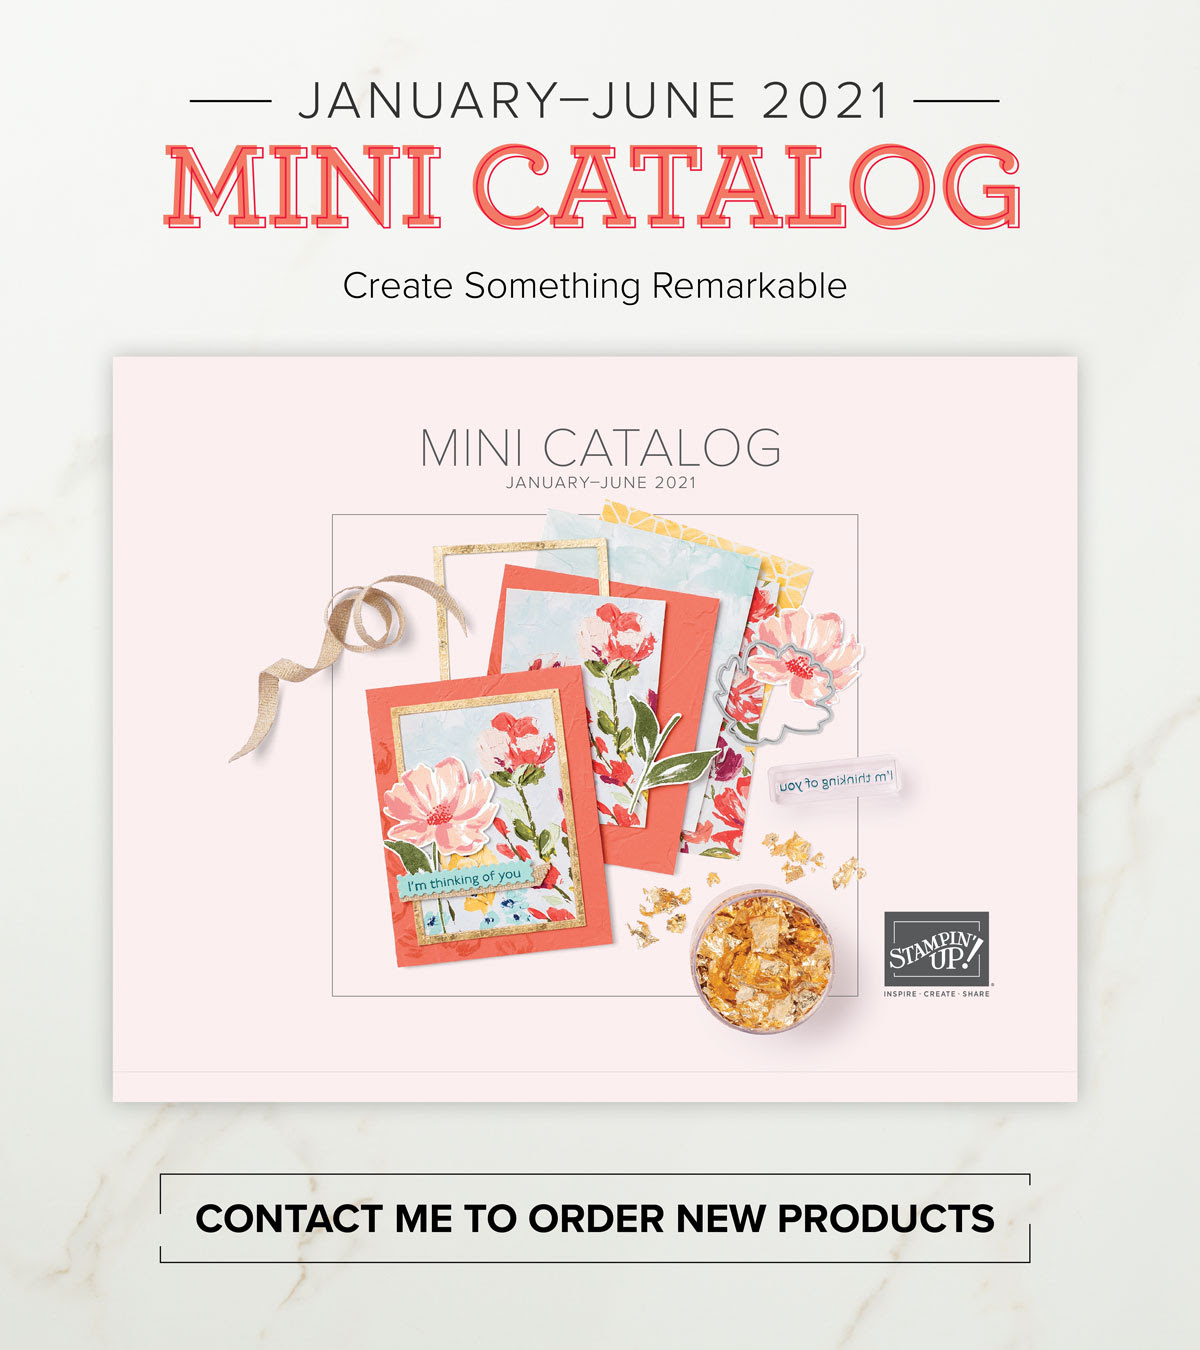 Download Digital Copy of the January-June Mini Catalog